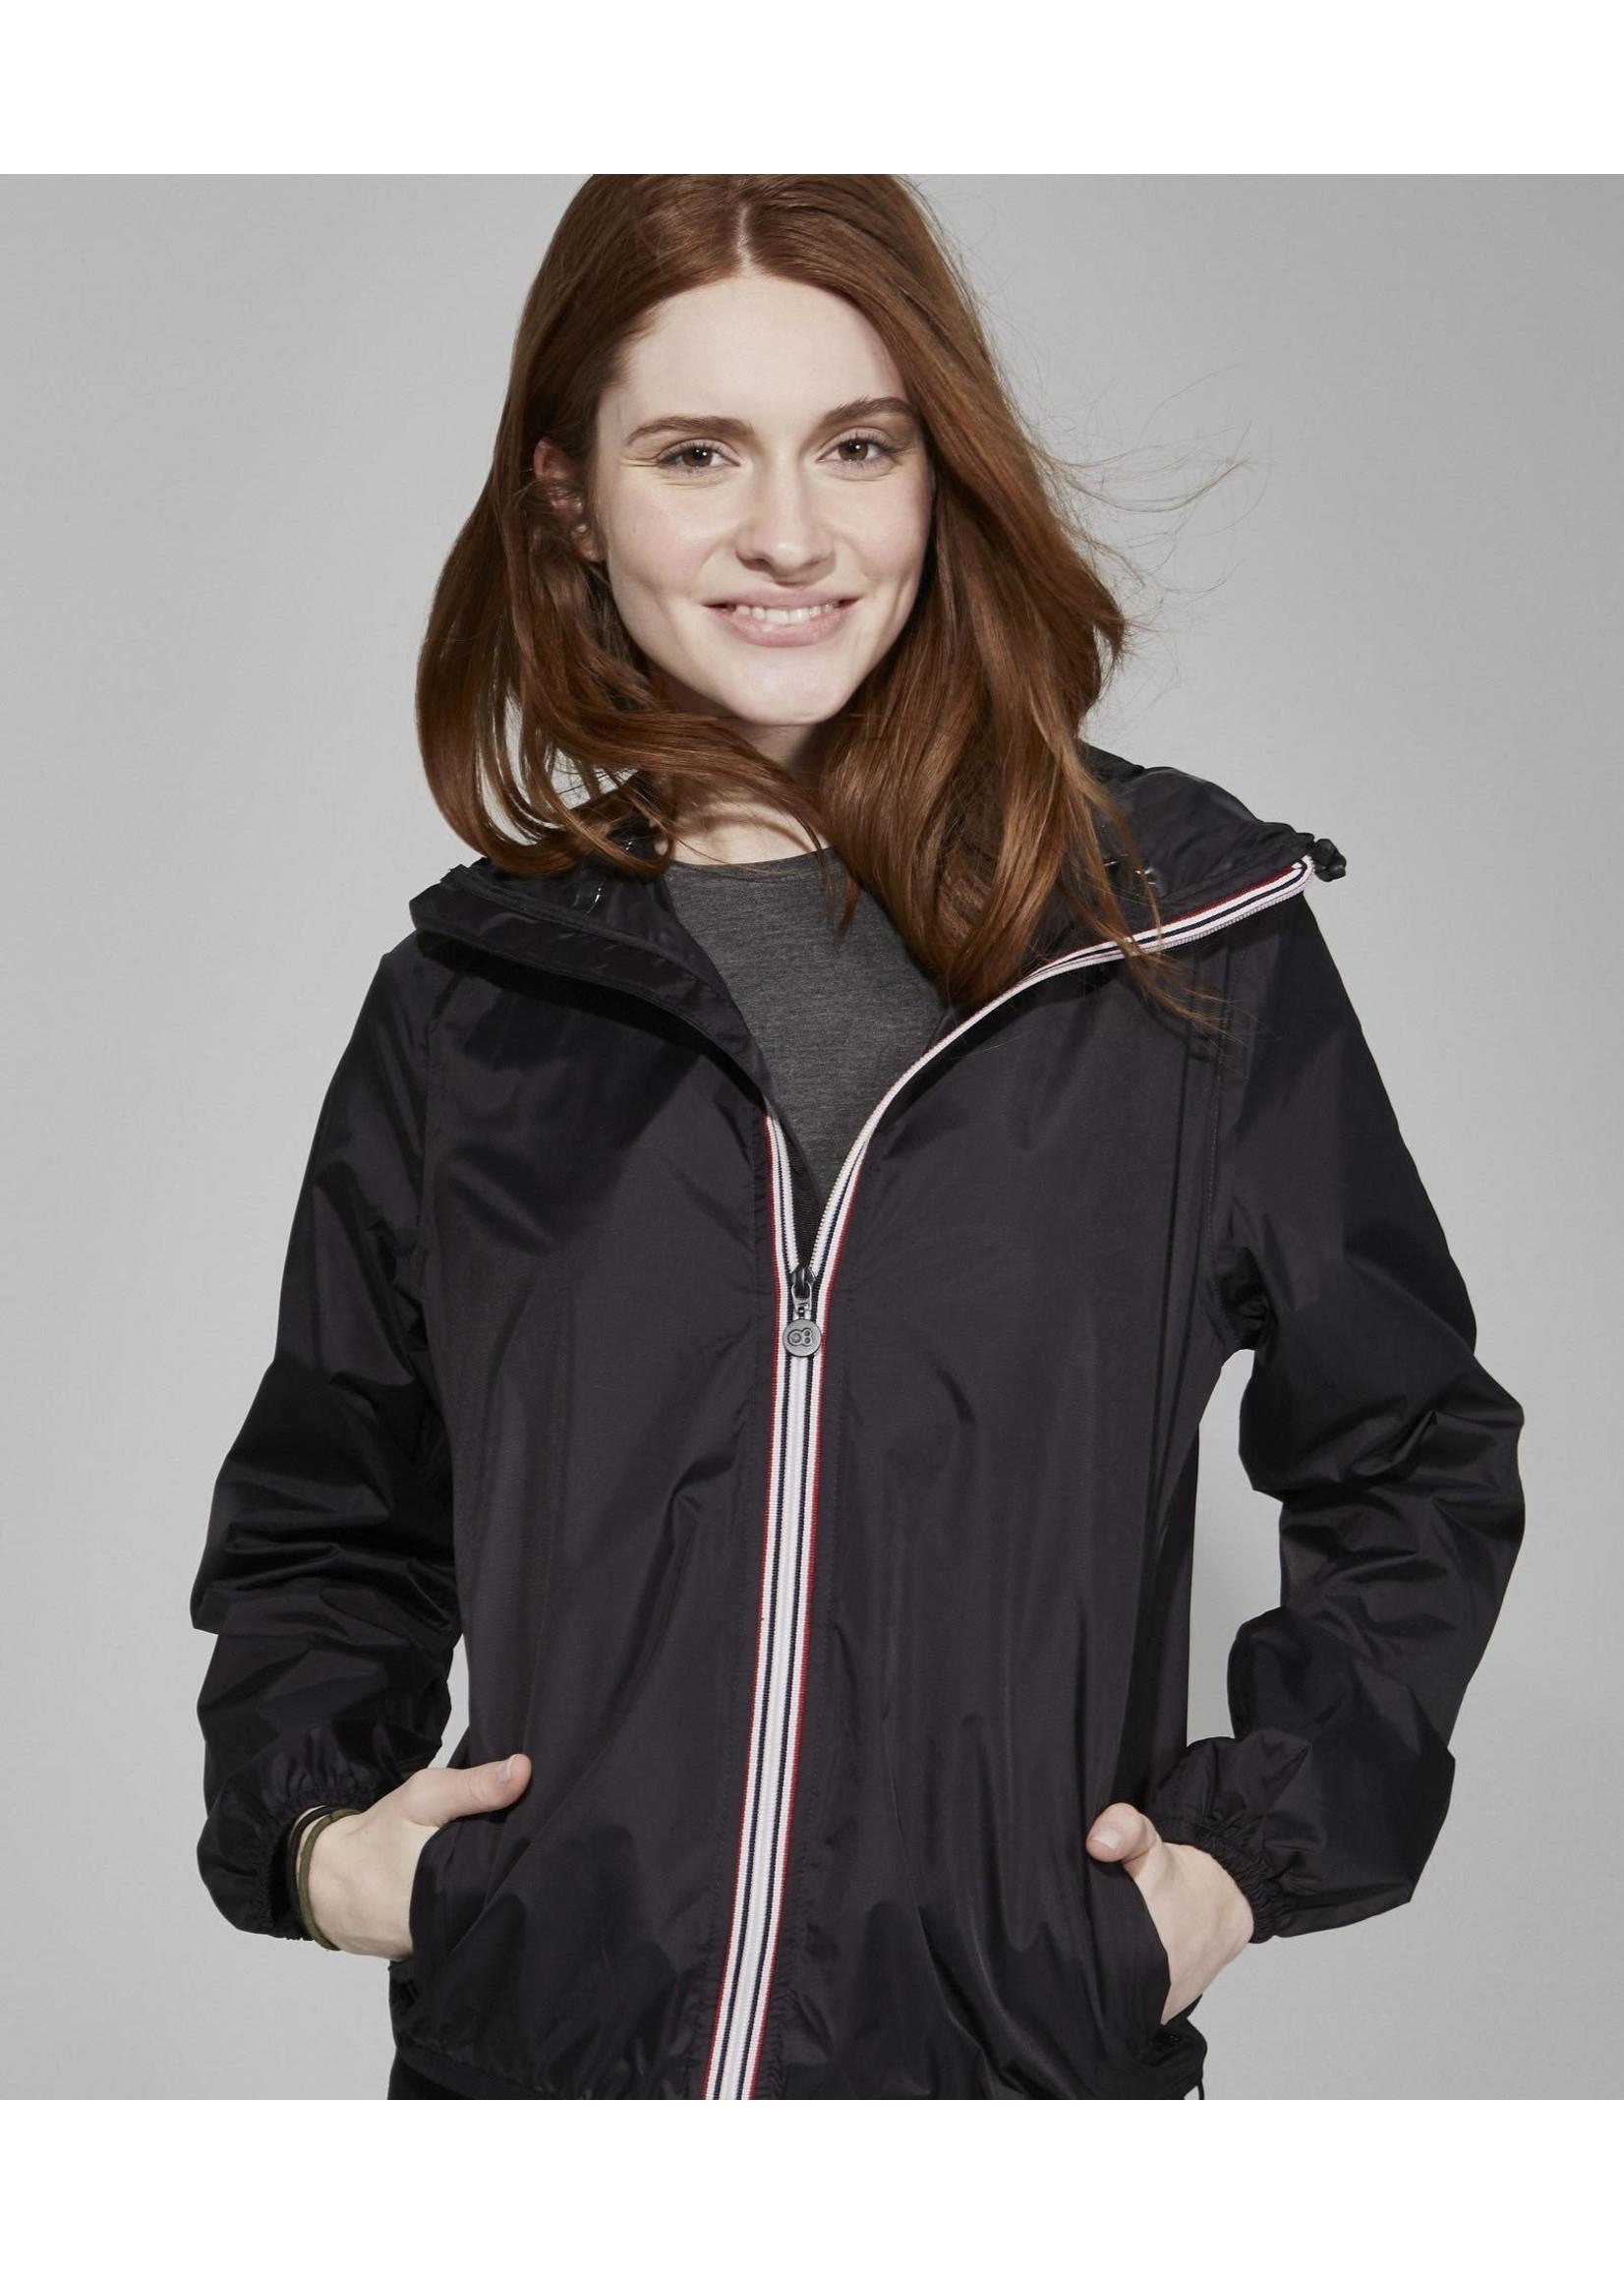 O8 O8 Woman Zip Jacket Black